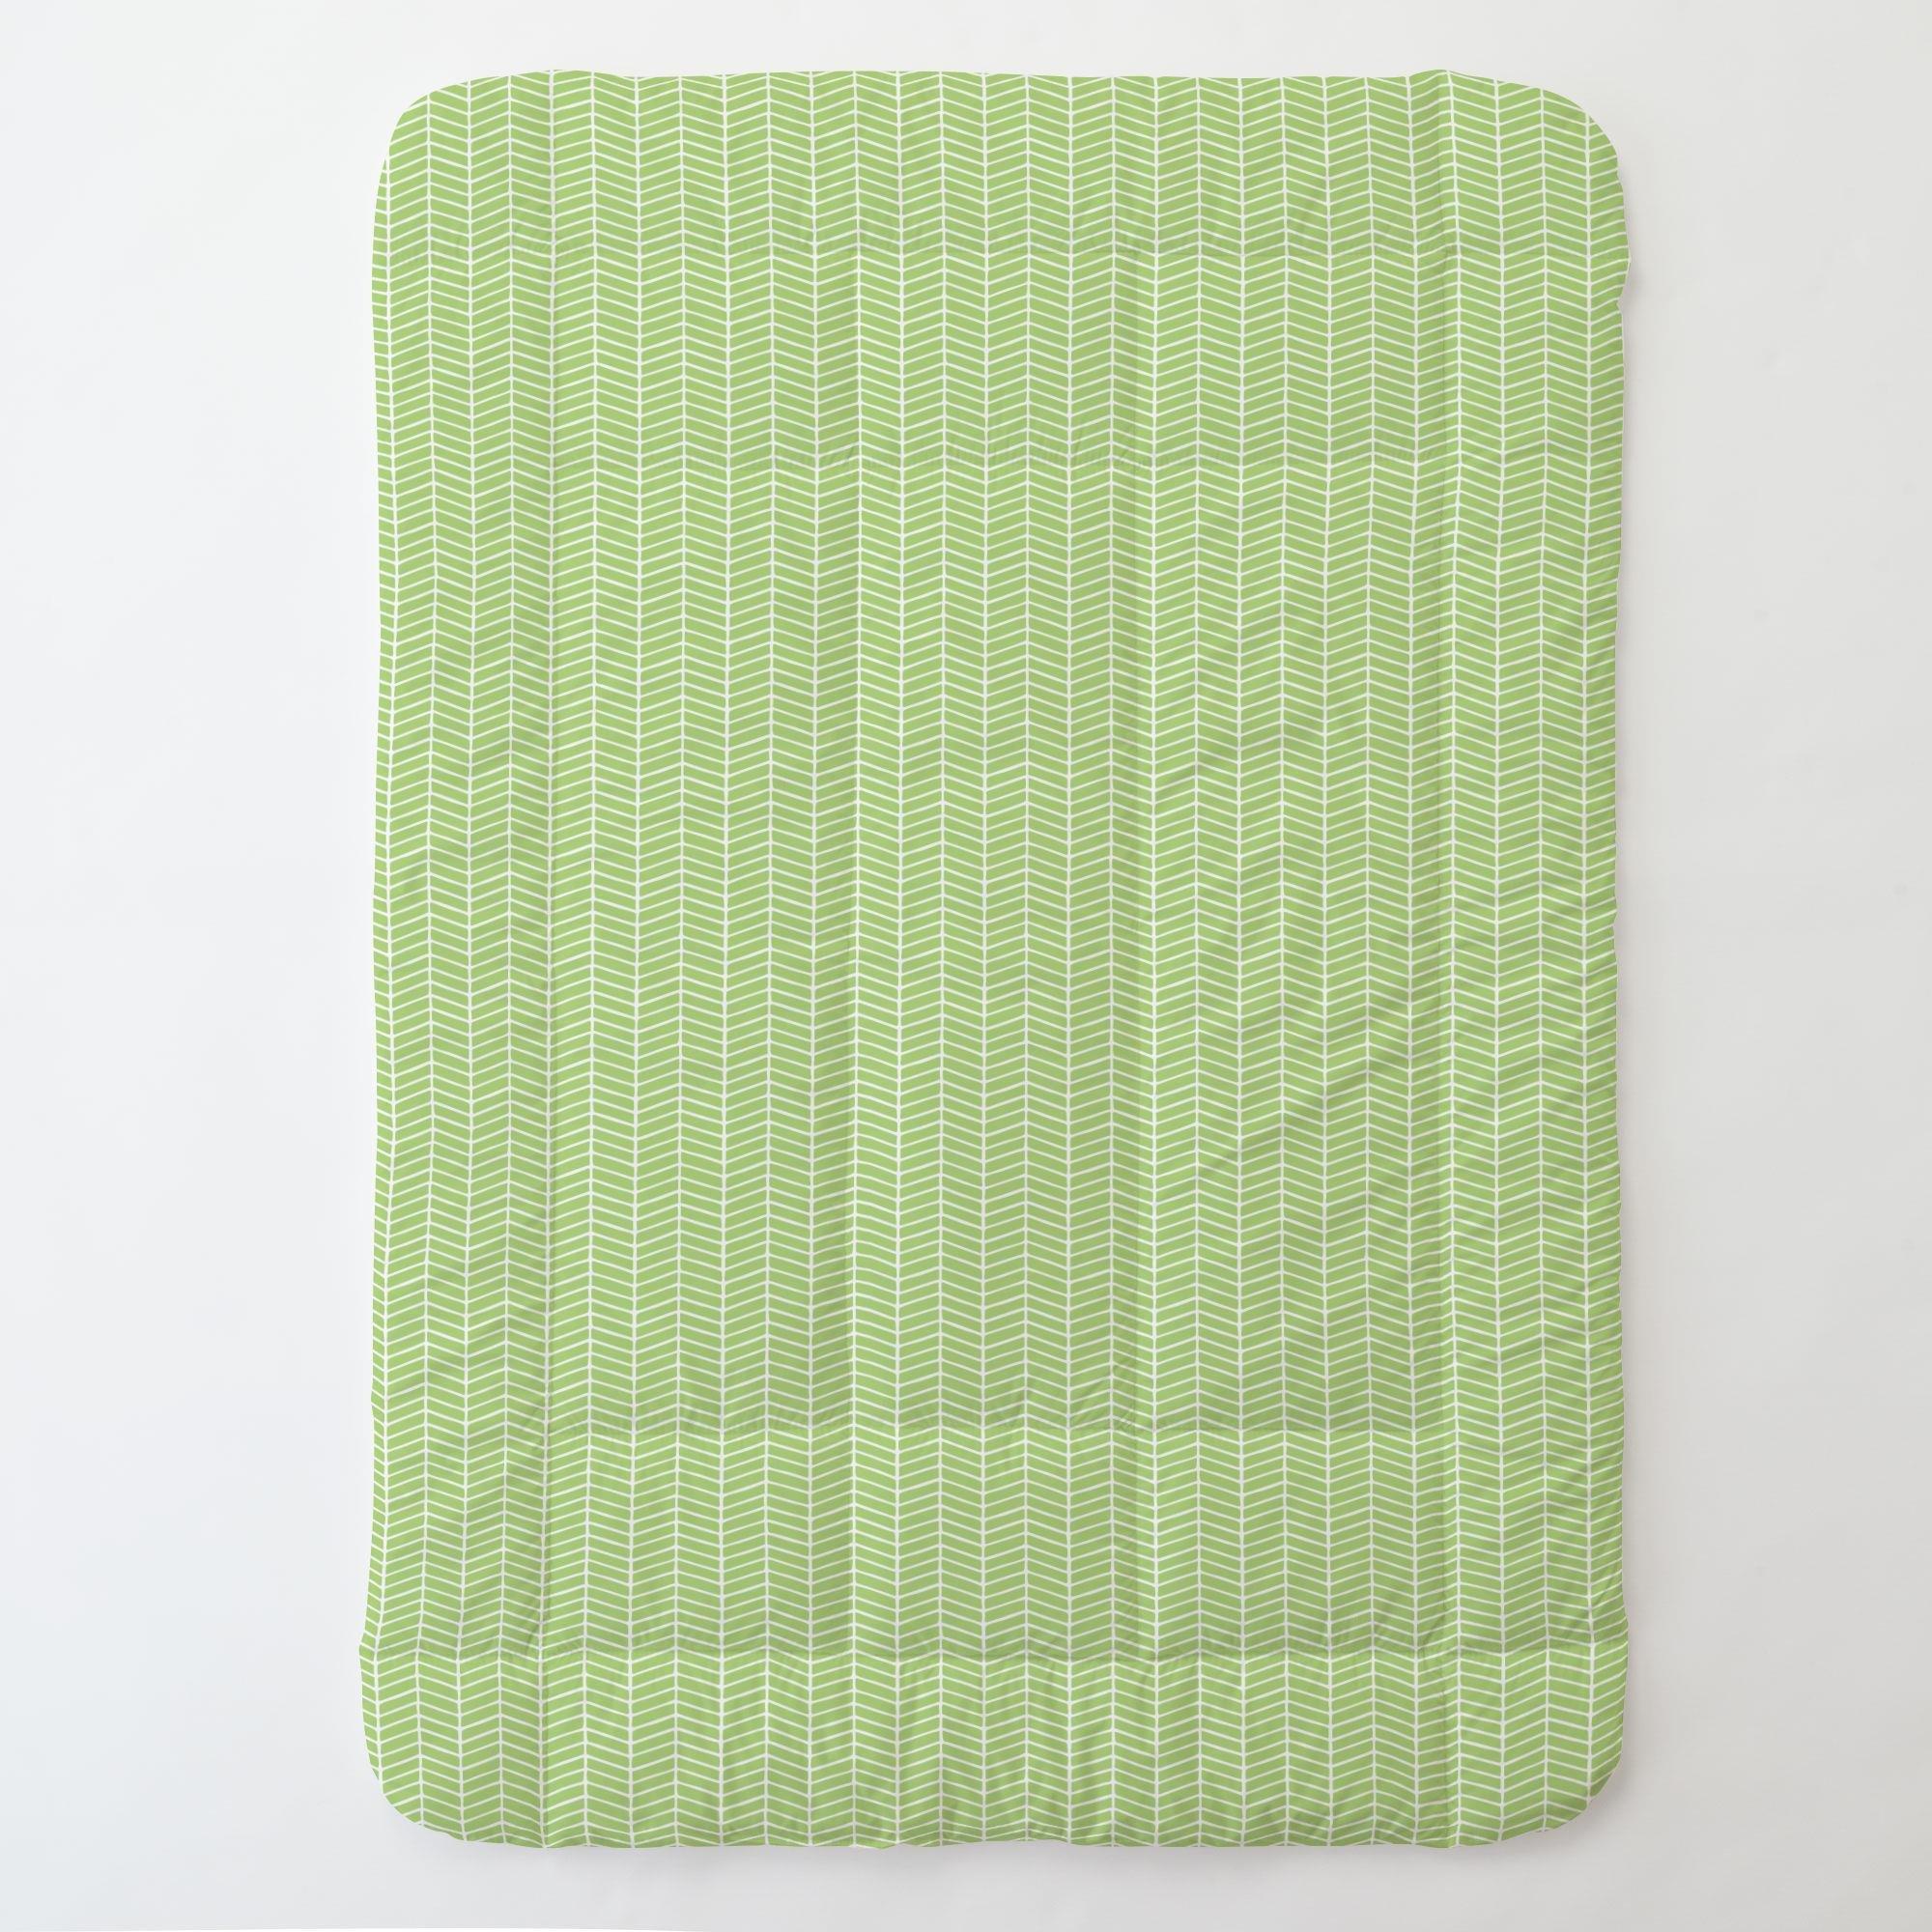 Carousel Designs Kiwi Herringbone Toddler Bed Comforter